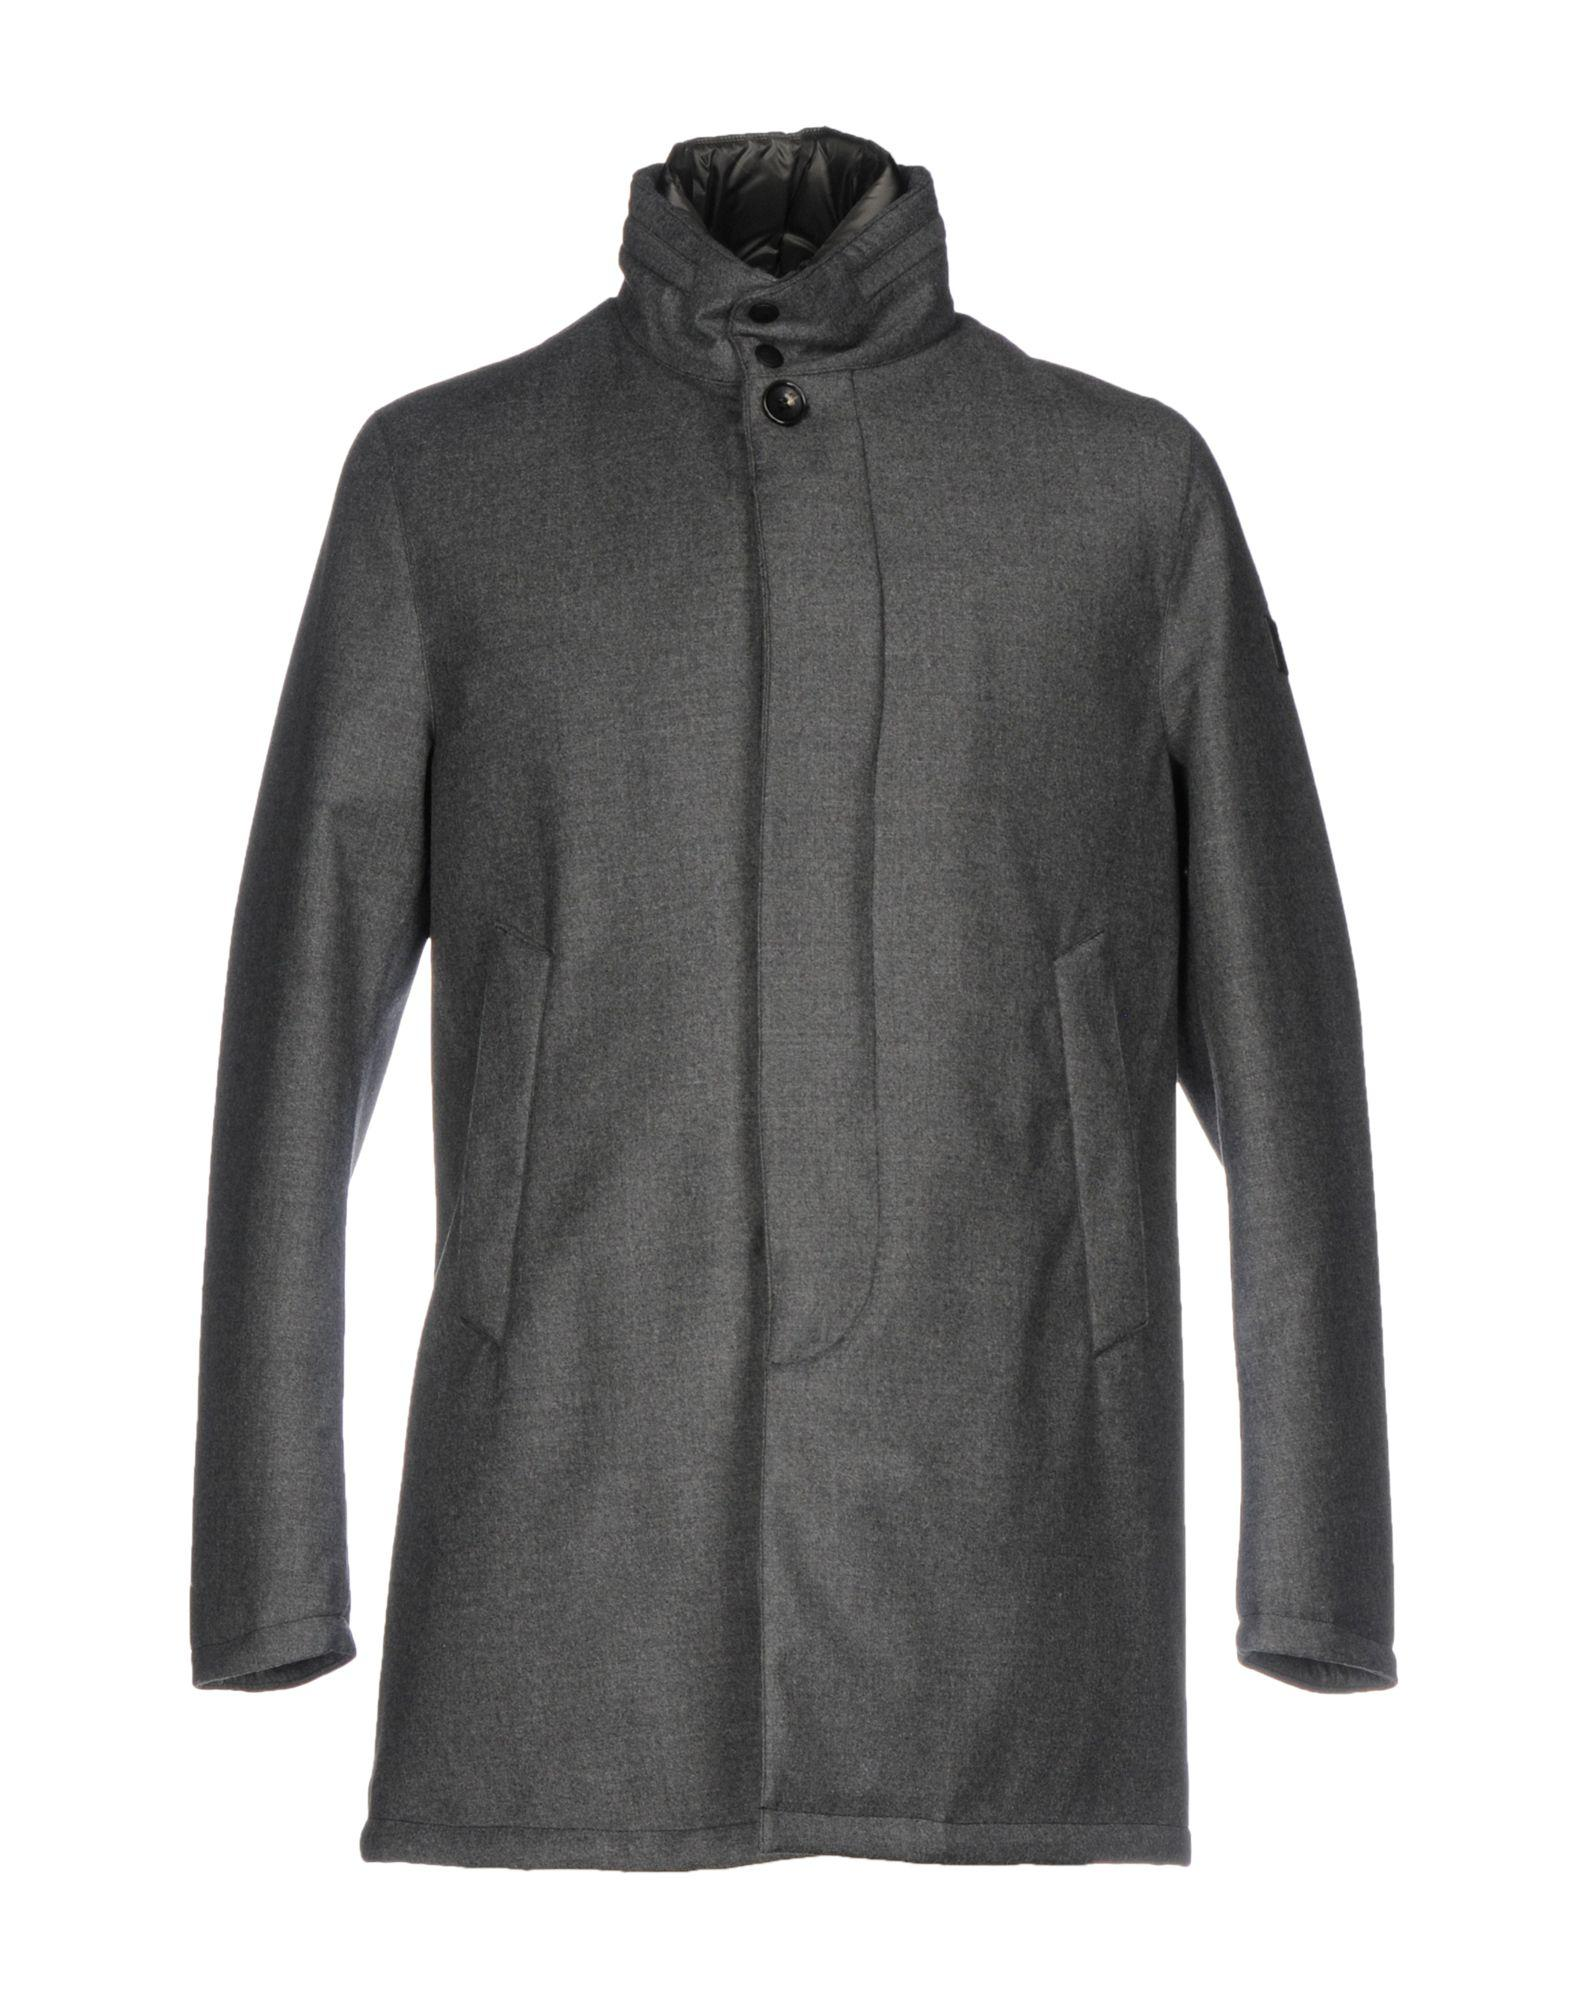 Montecore Down Jackets In Grey